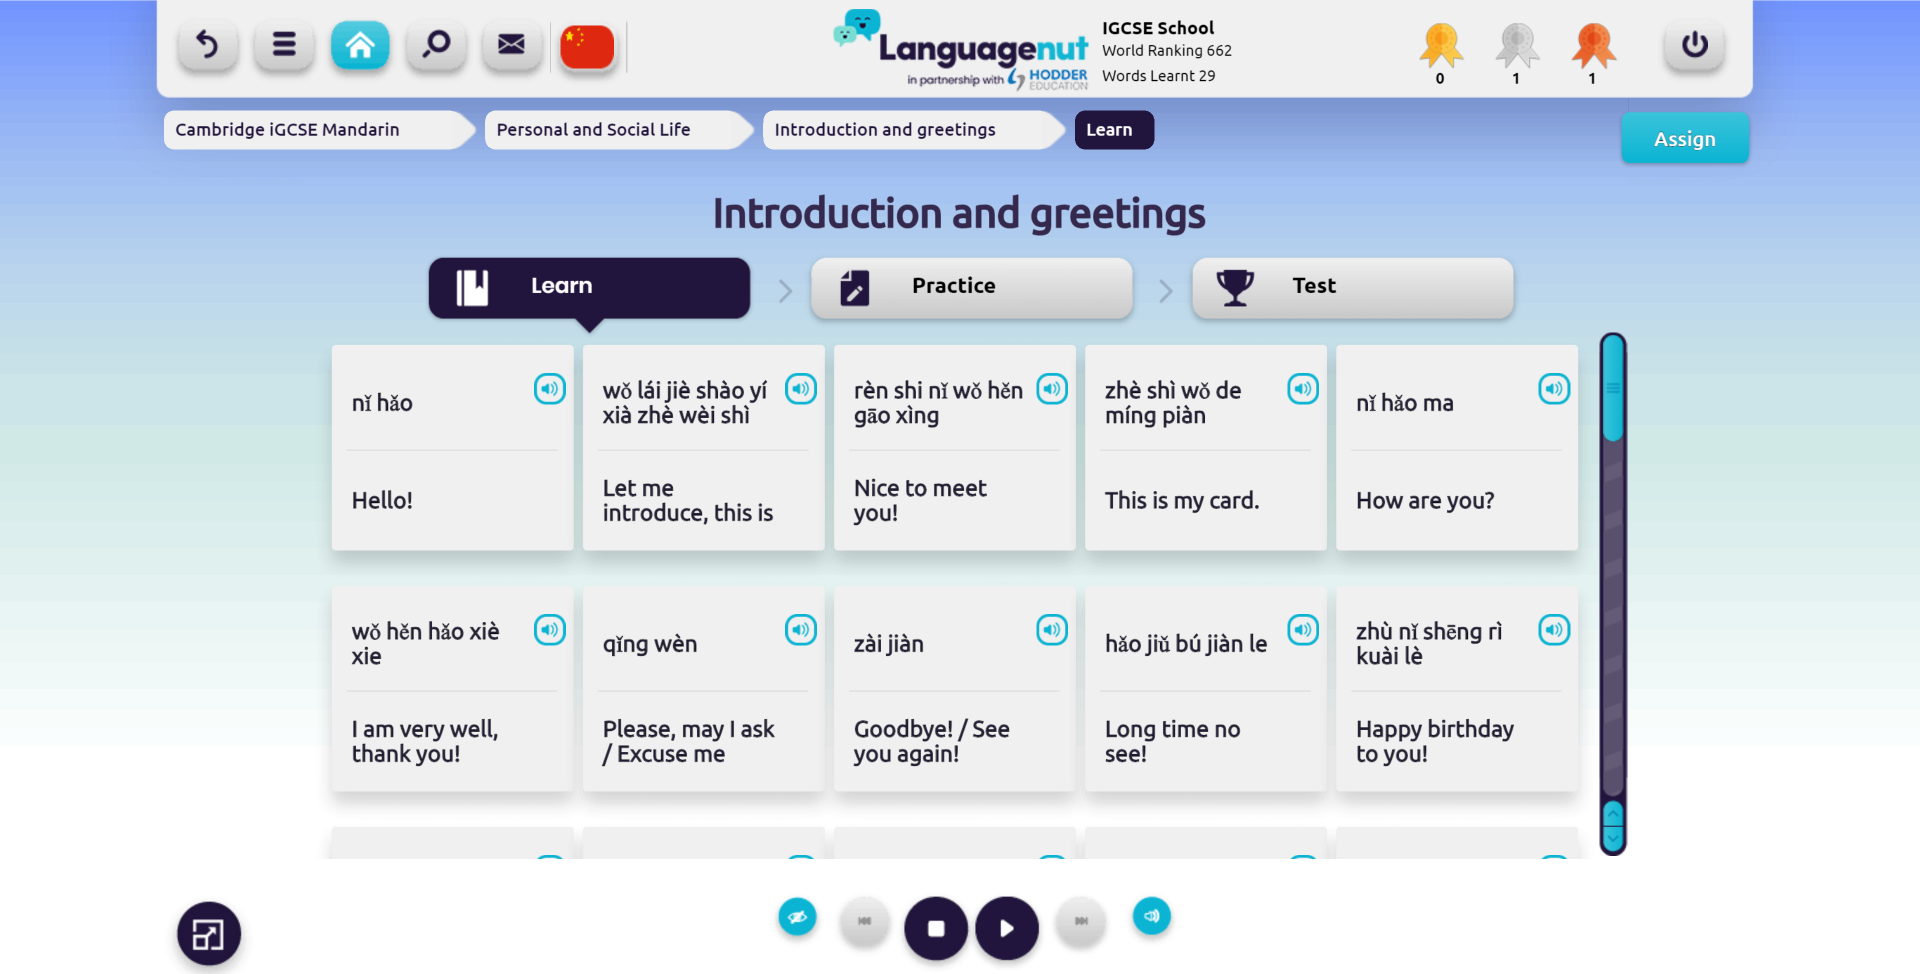 Digital Language Resources for IGCSE | Hodder Education